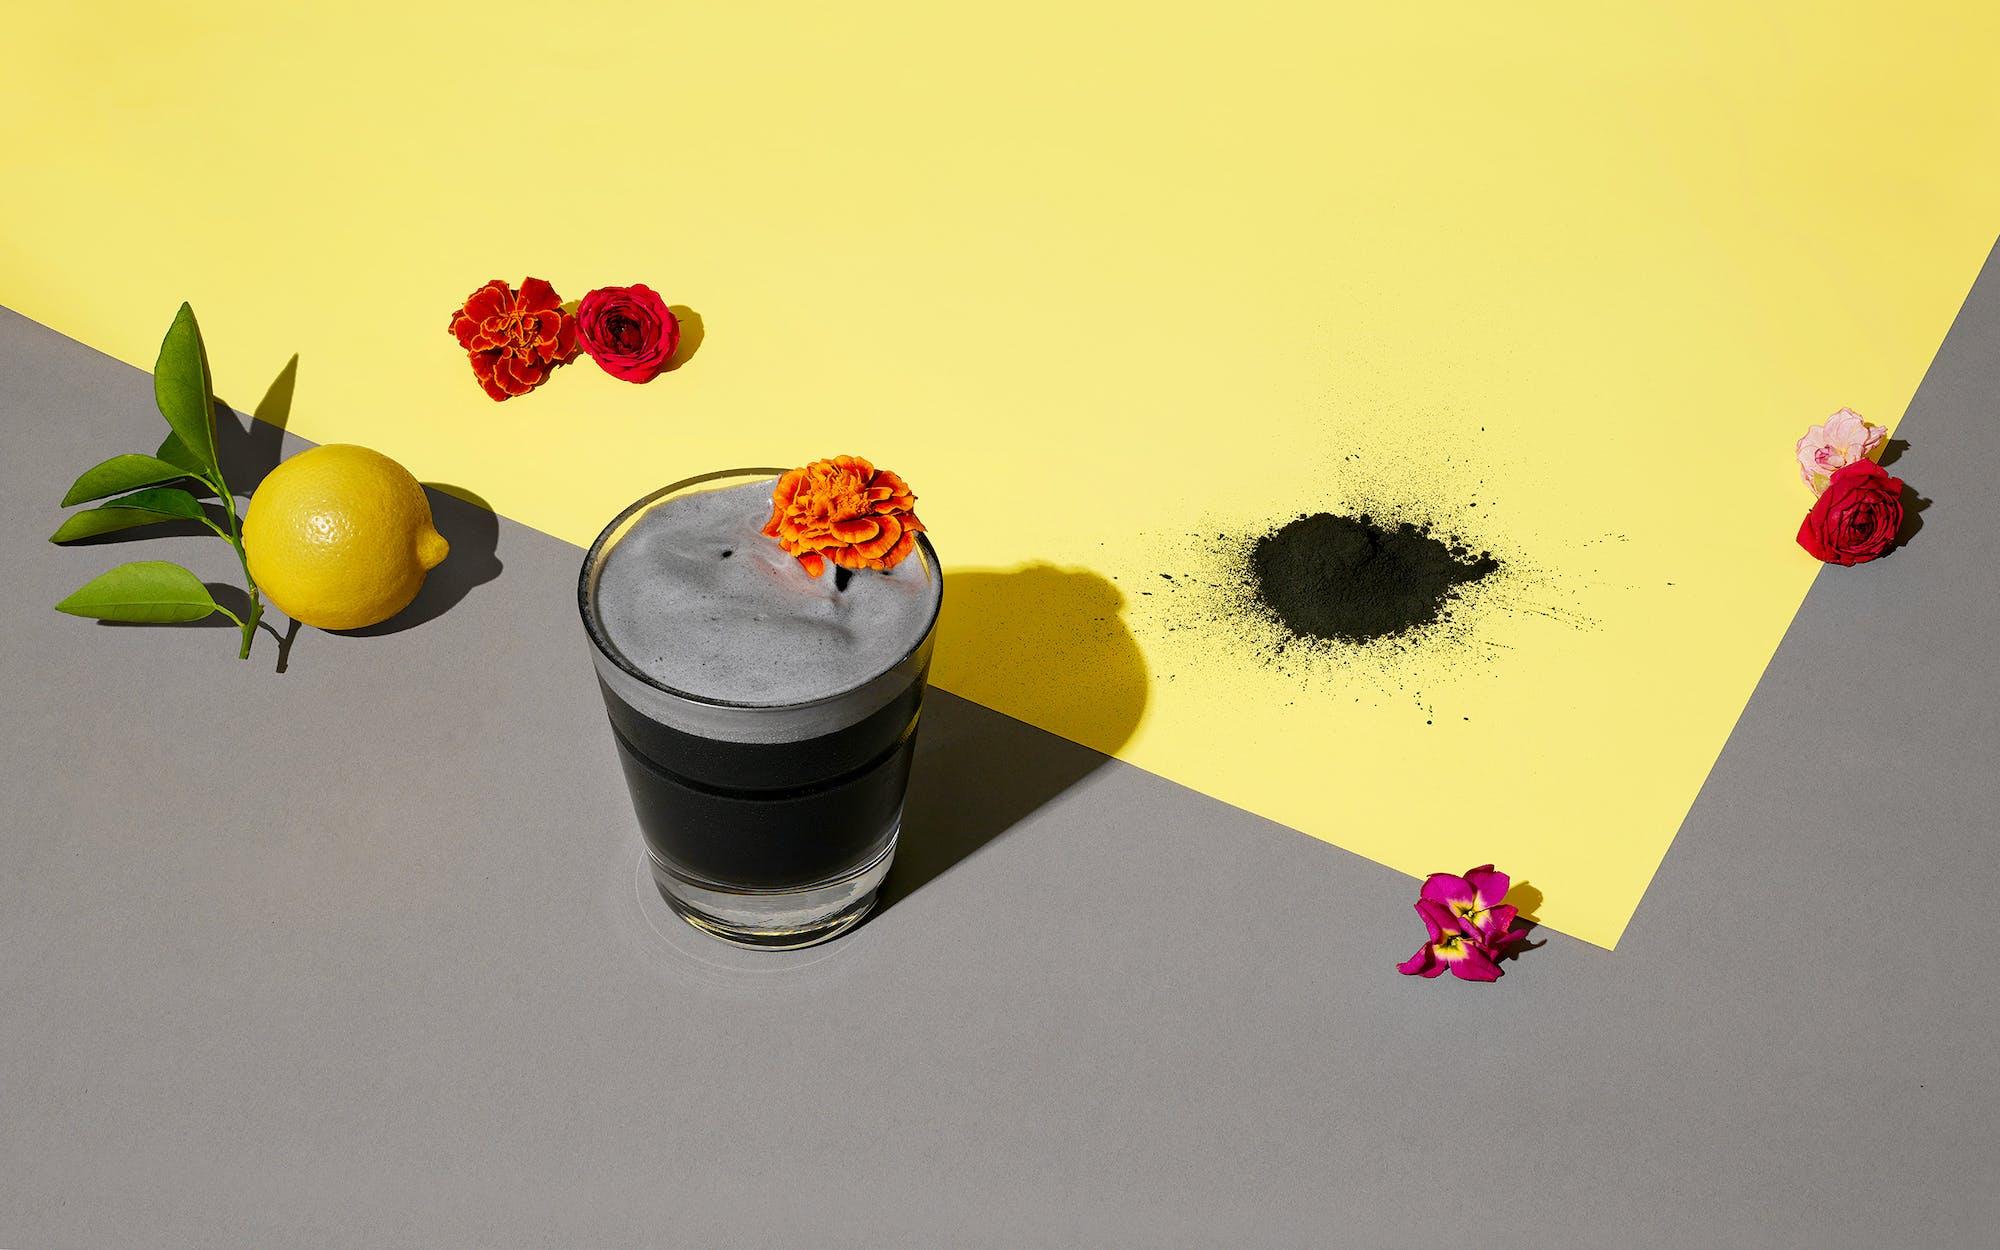 The Detox to Retox cocktail